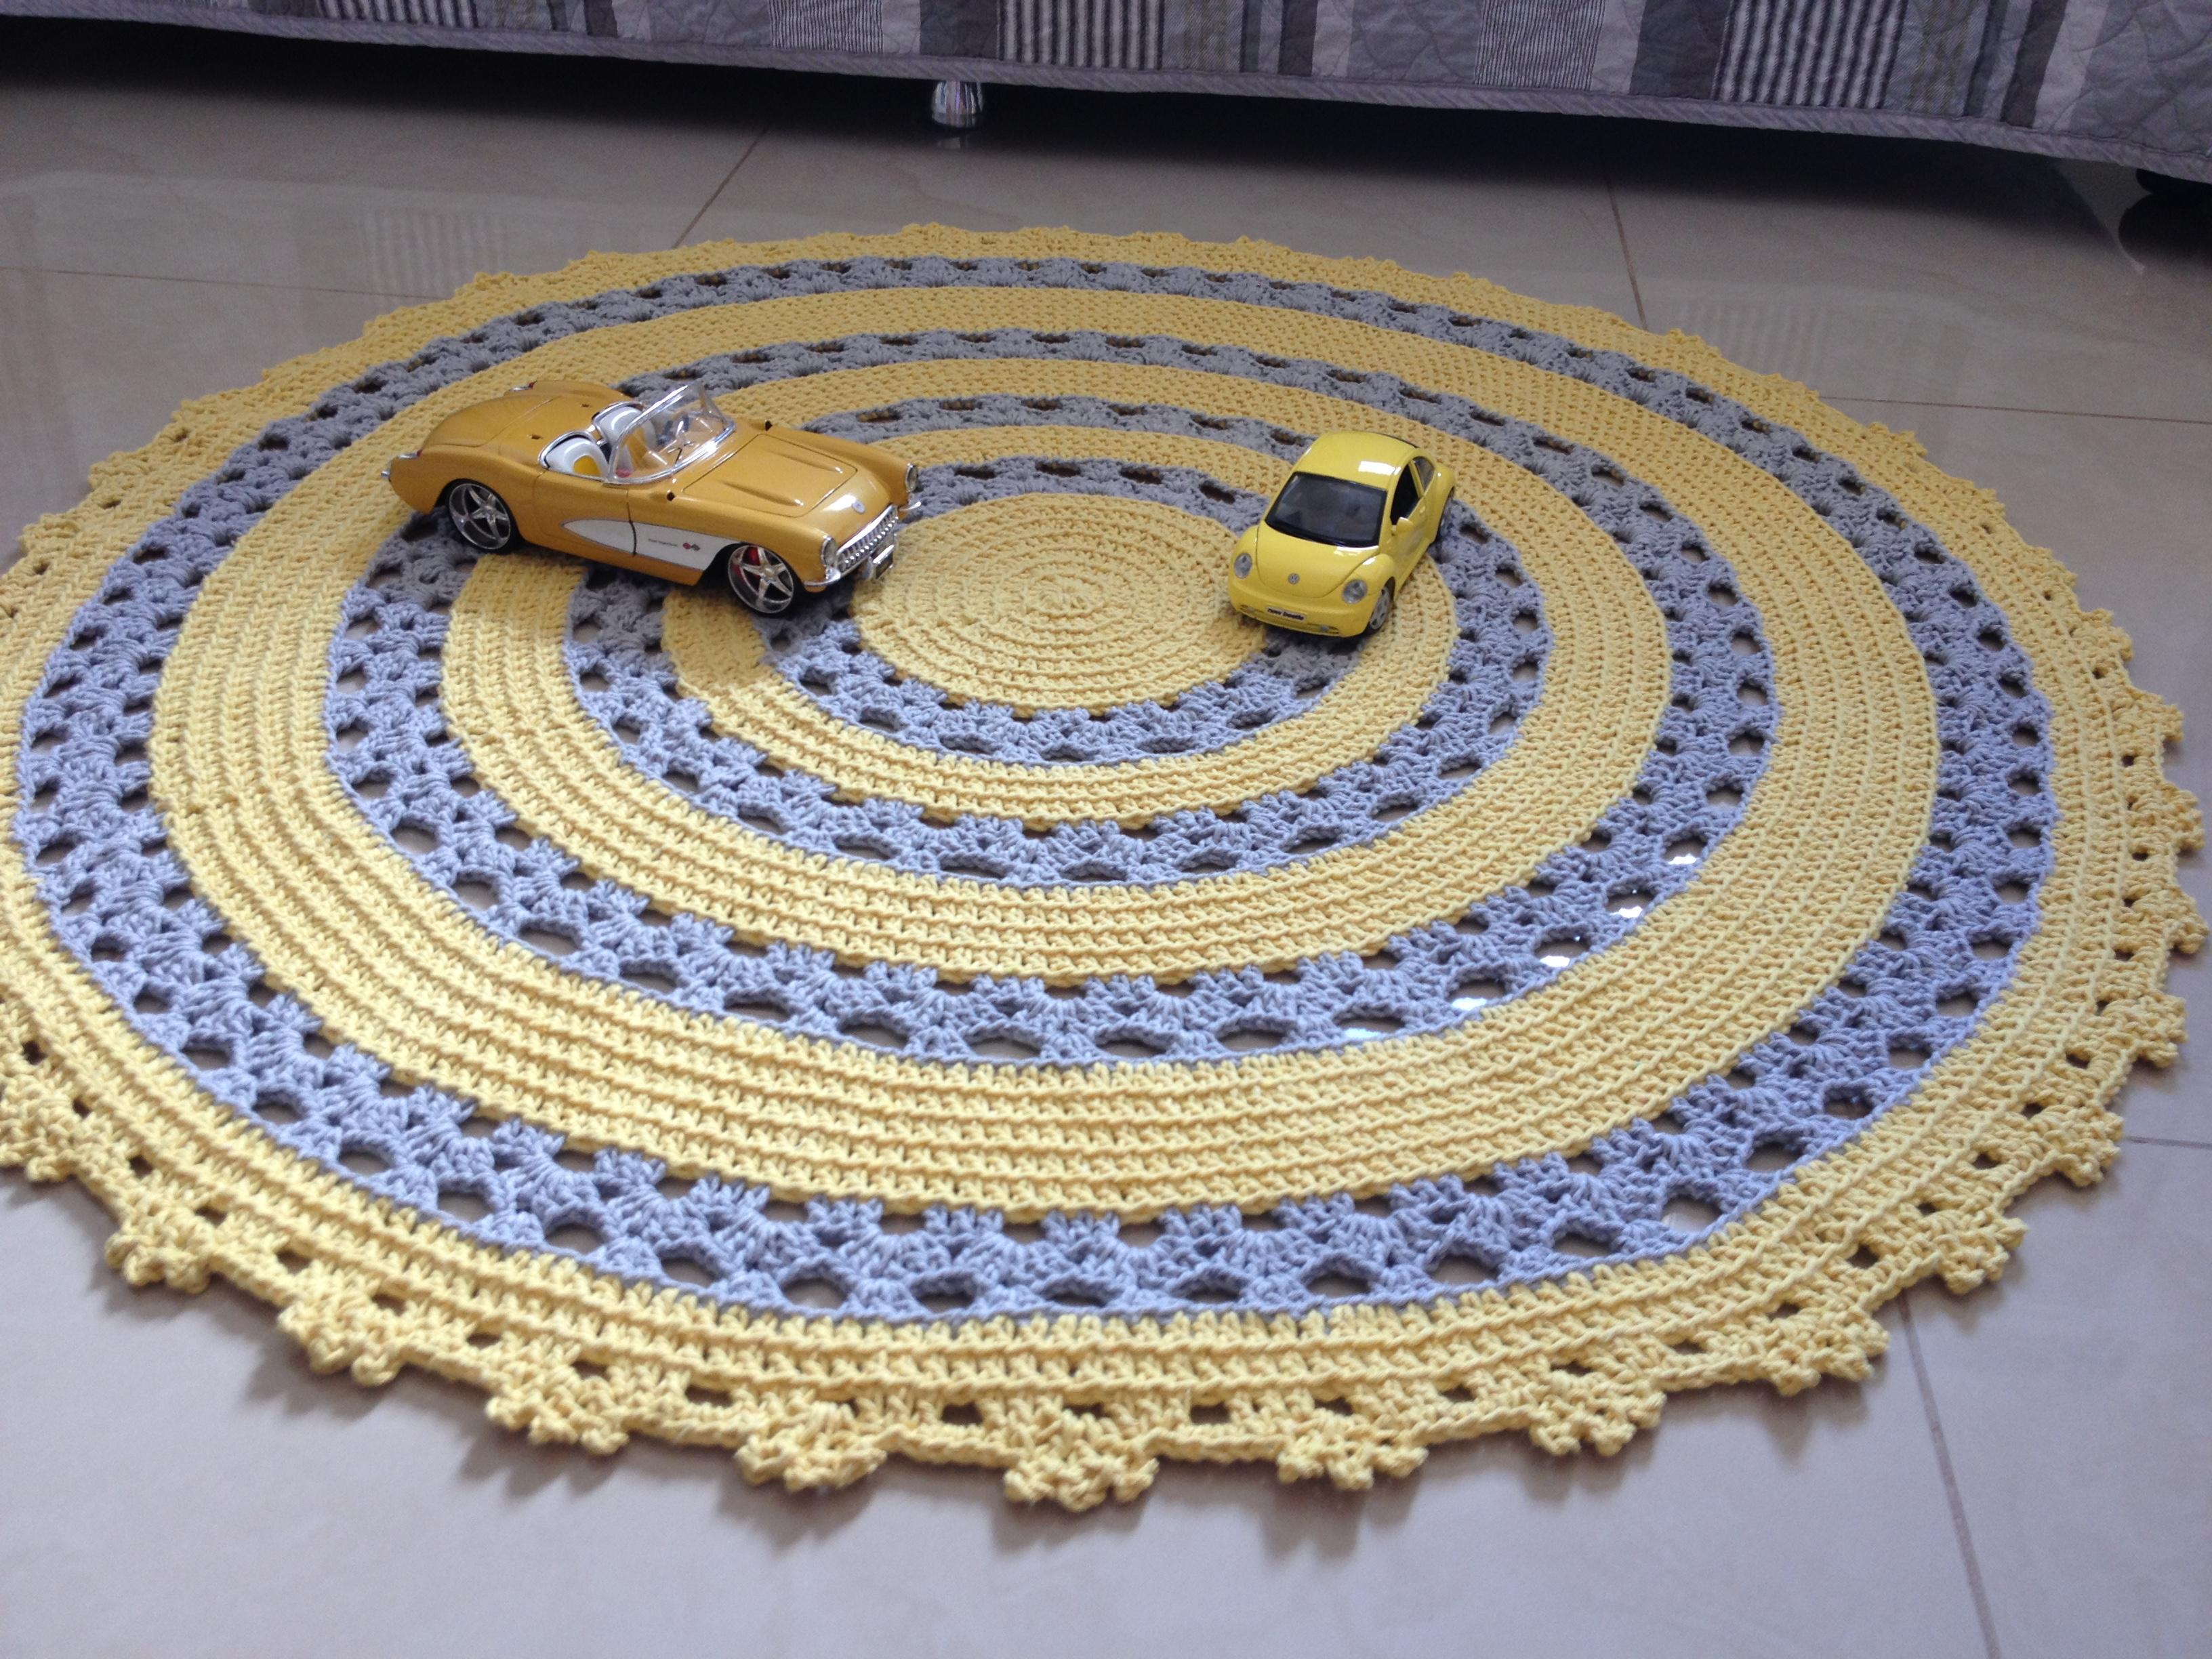 Tapete amarelo e cinza Ateliê Vera Peixoto Elo7